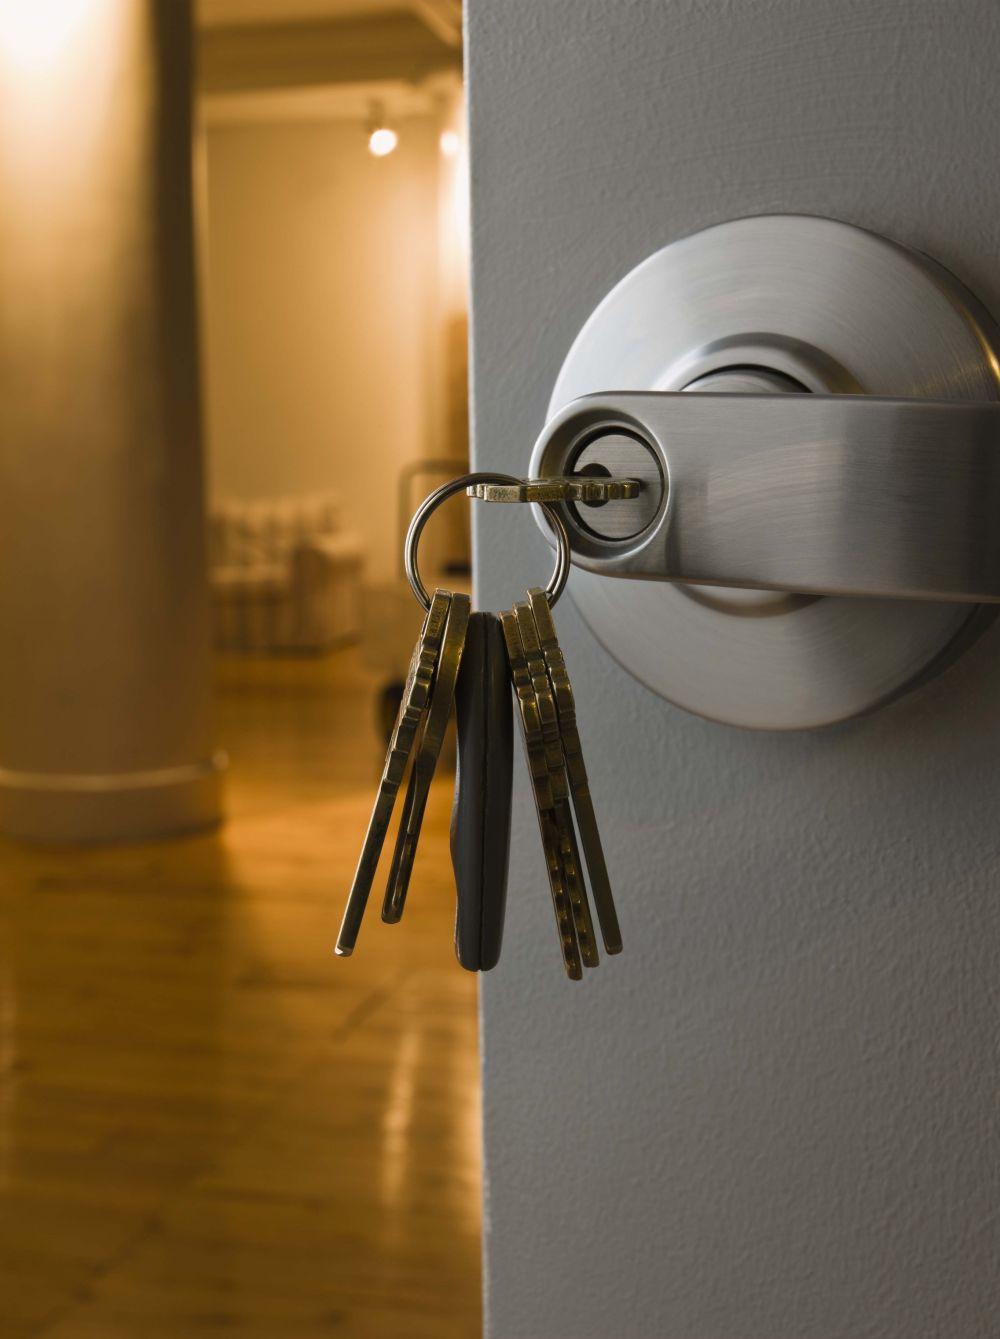 Set of keys in a lock by lock service in Anchorage, AK